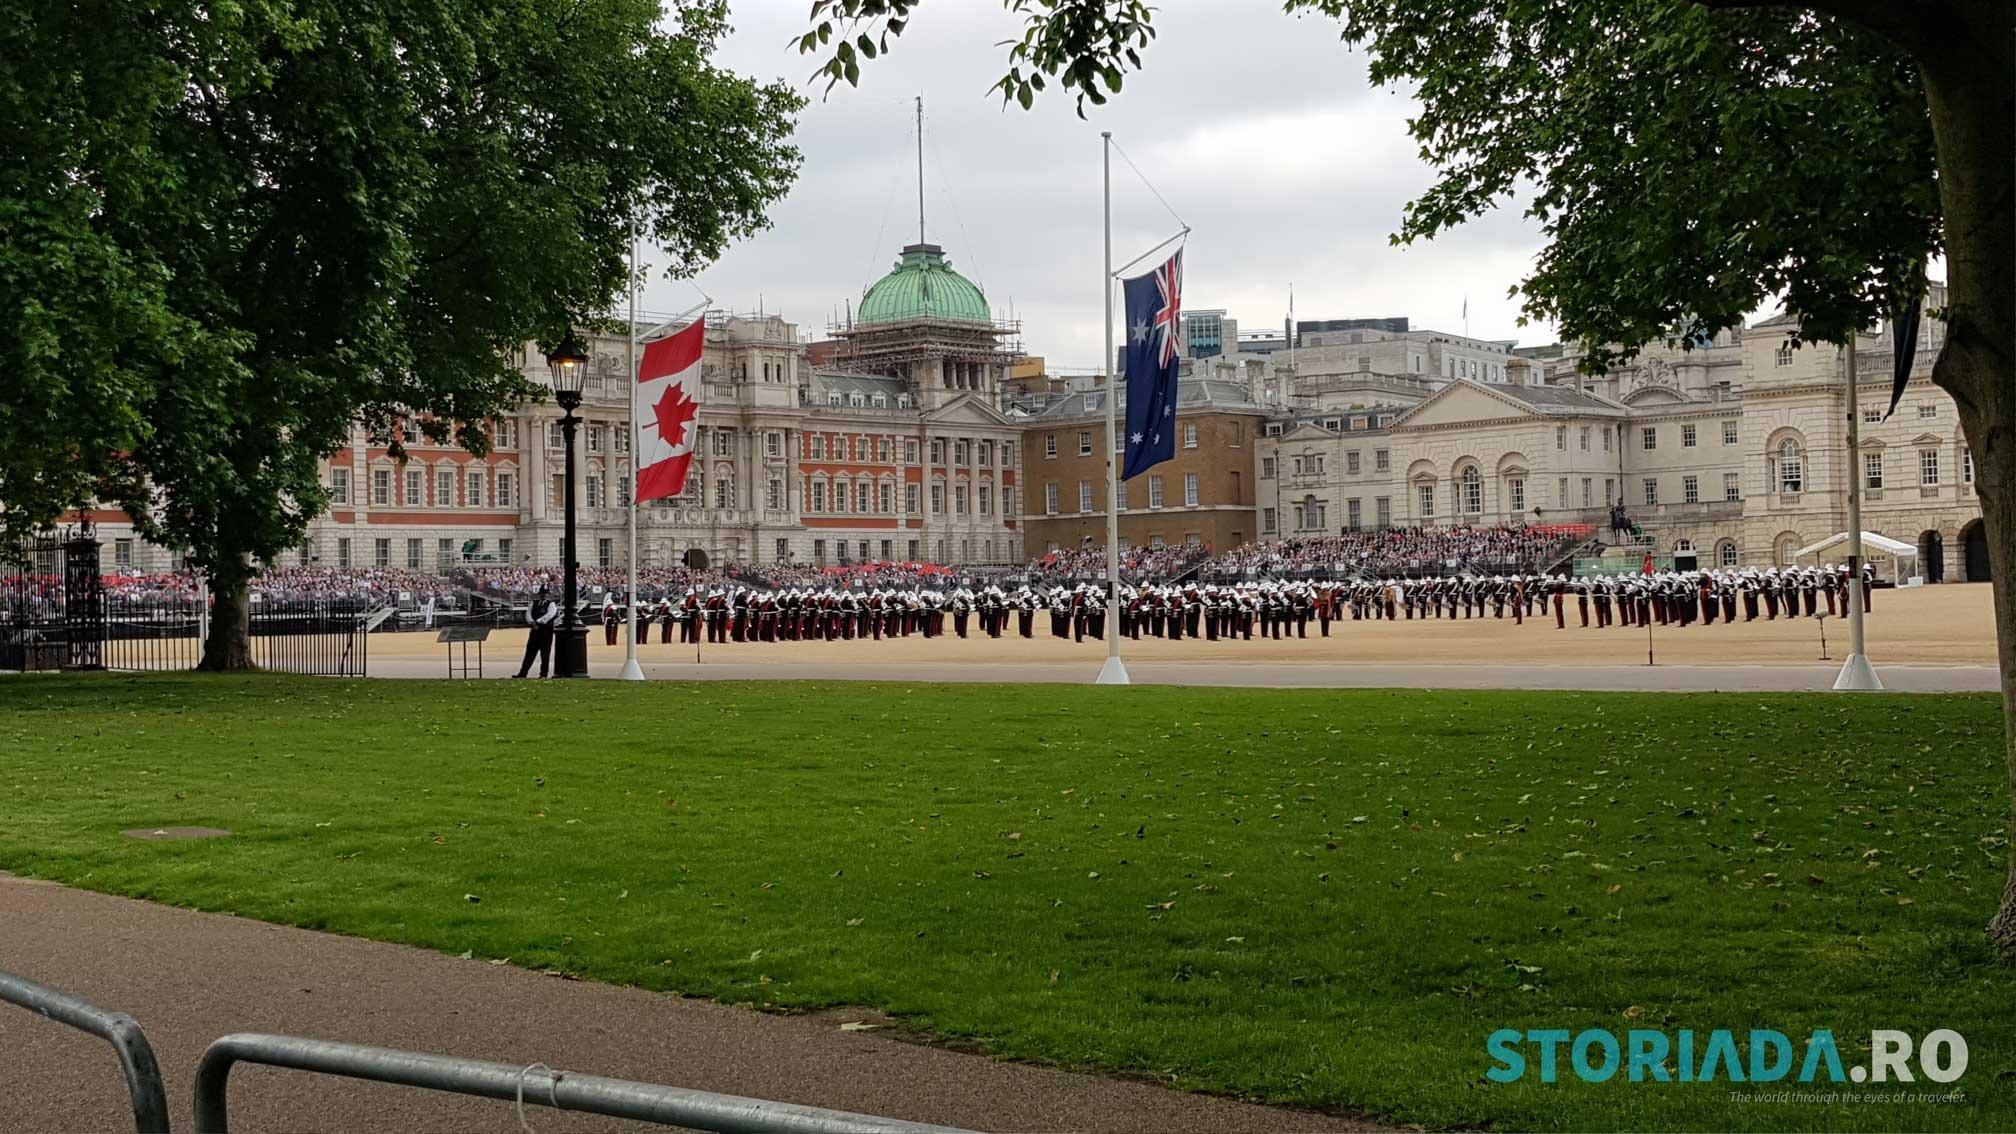 The British Royal Army, Marine Army Parade